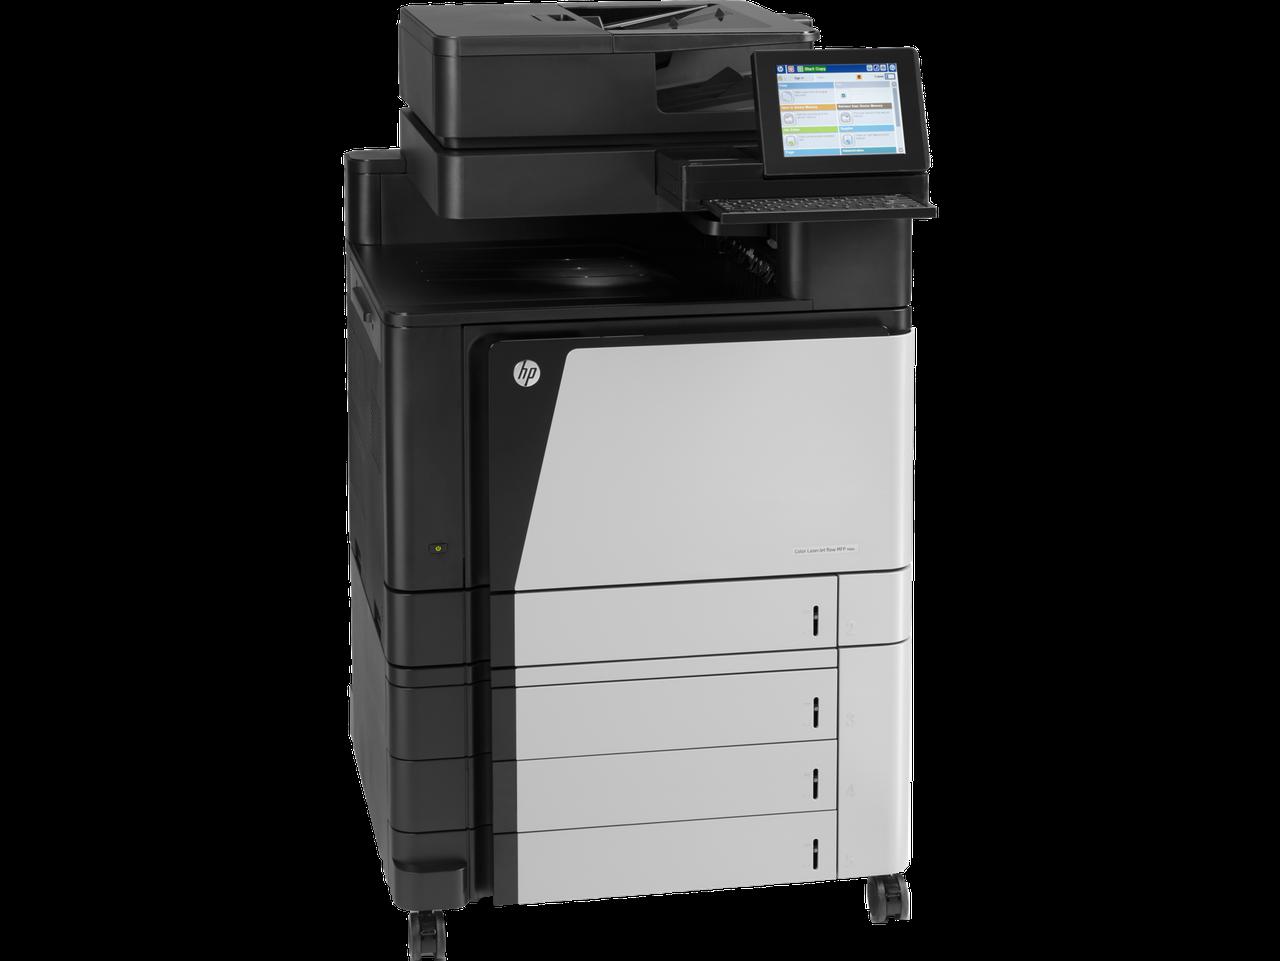 МФУ HP LaserJet M880z A2W75A, A3, Печать:1200x1200dpi, Коп./Скан/Факс